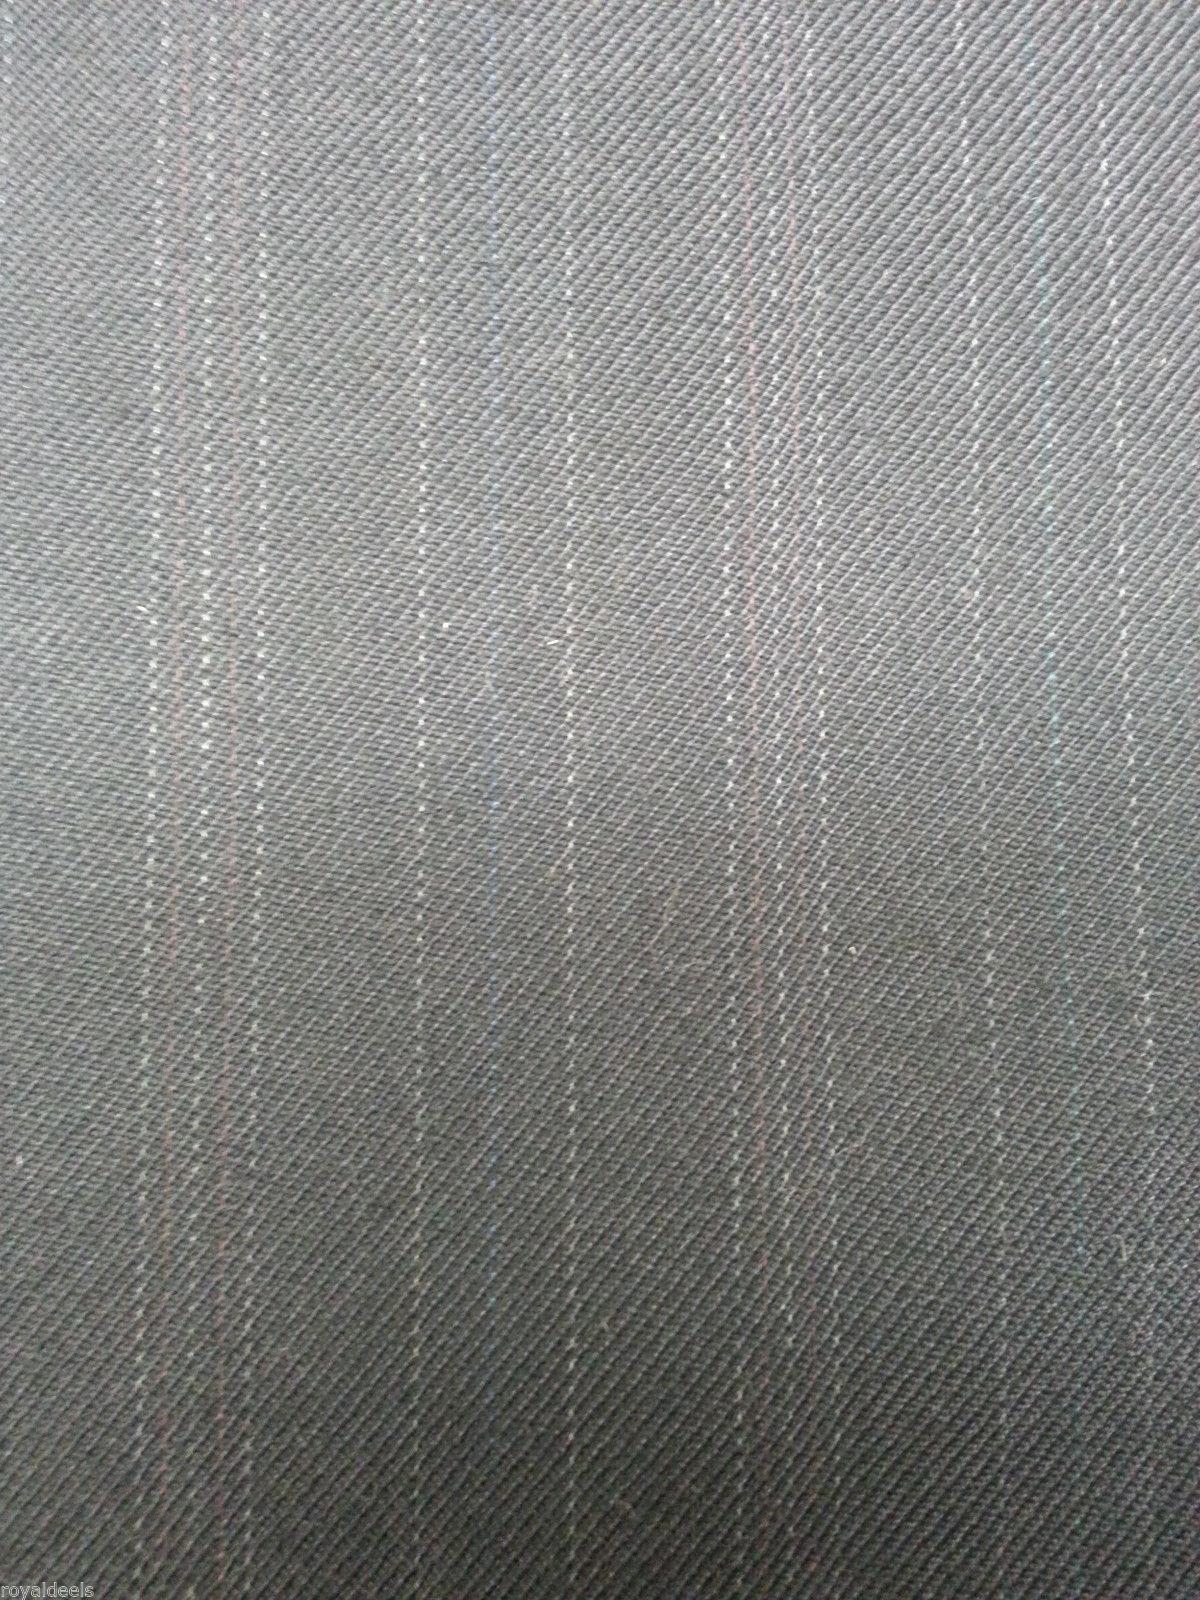 5.5 YRD NAVY BLUE ENGLISH WOOL Pin Stripe Suit Skirt Fashion Sewing Fabric